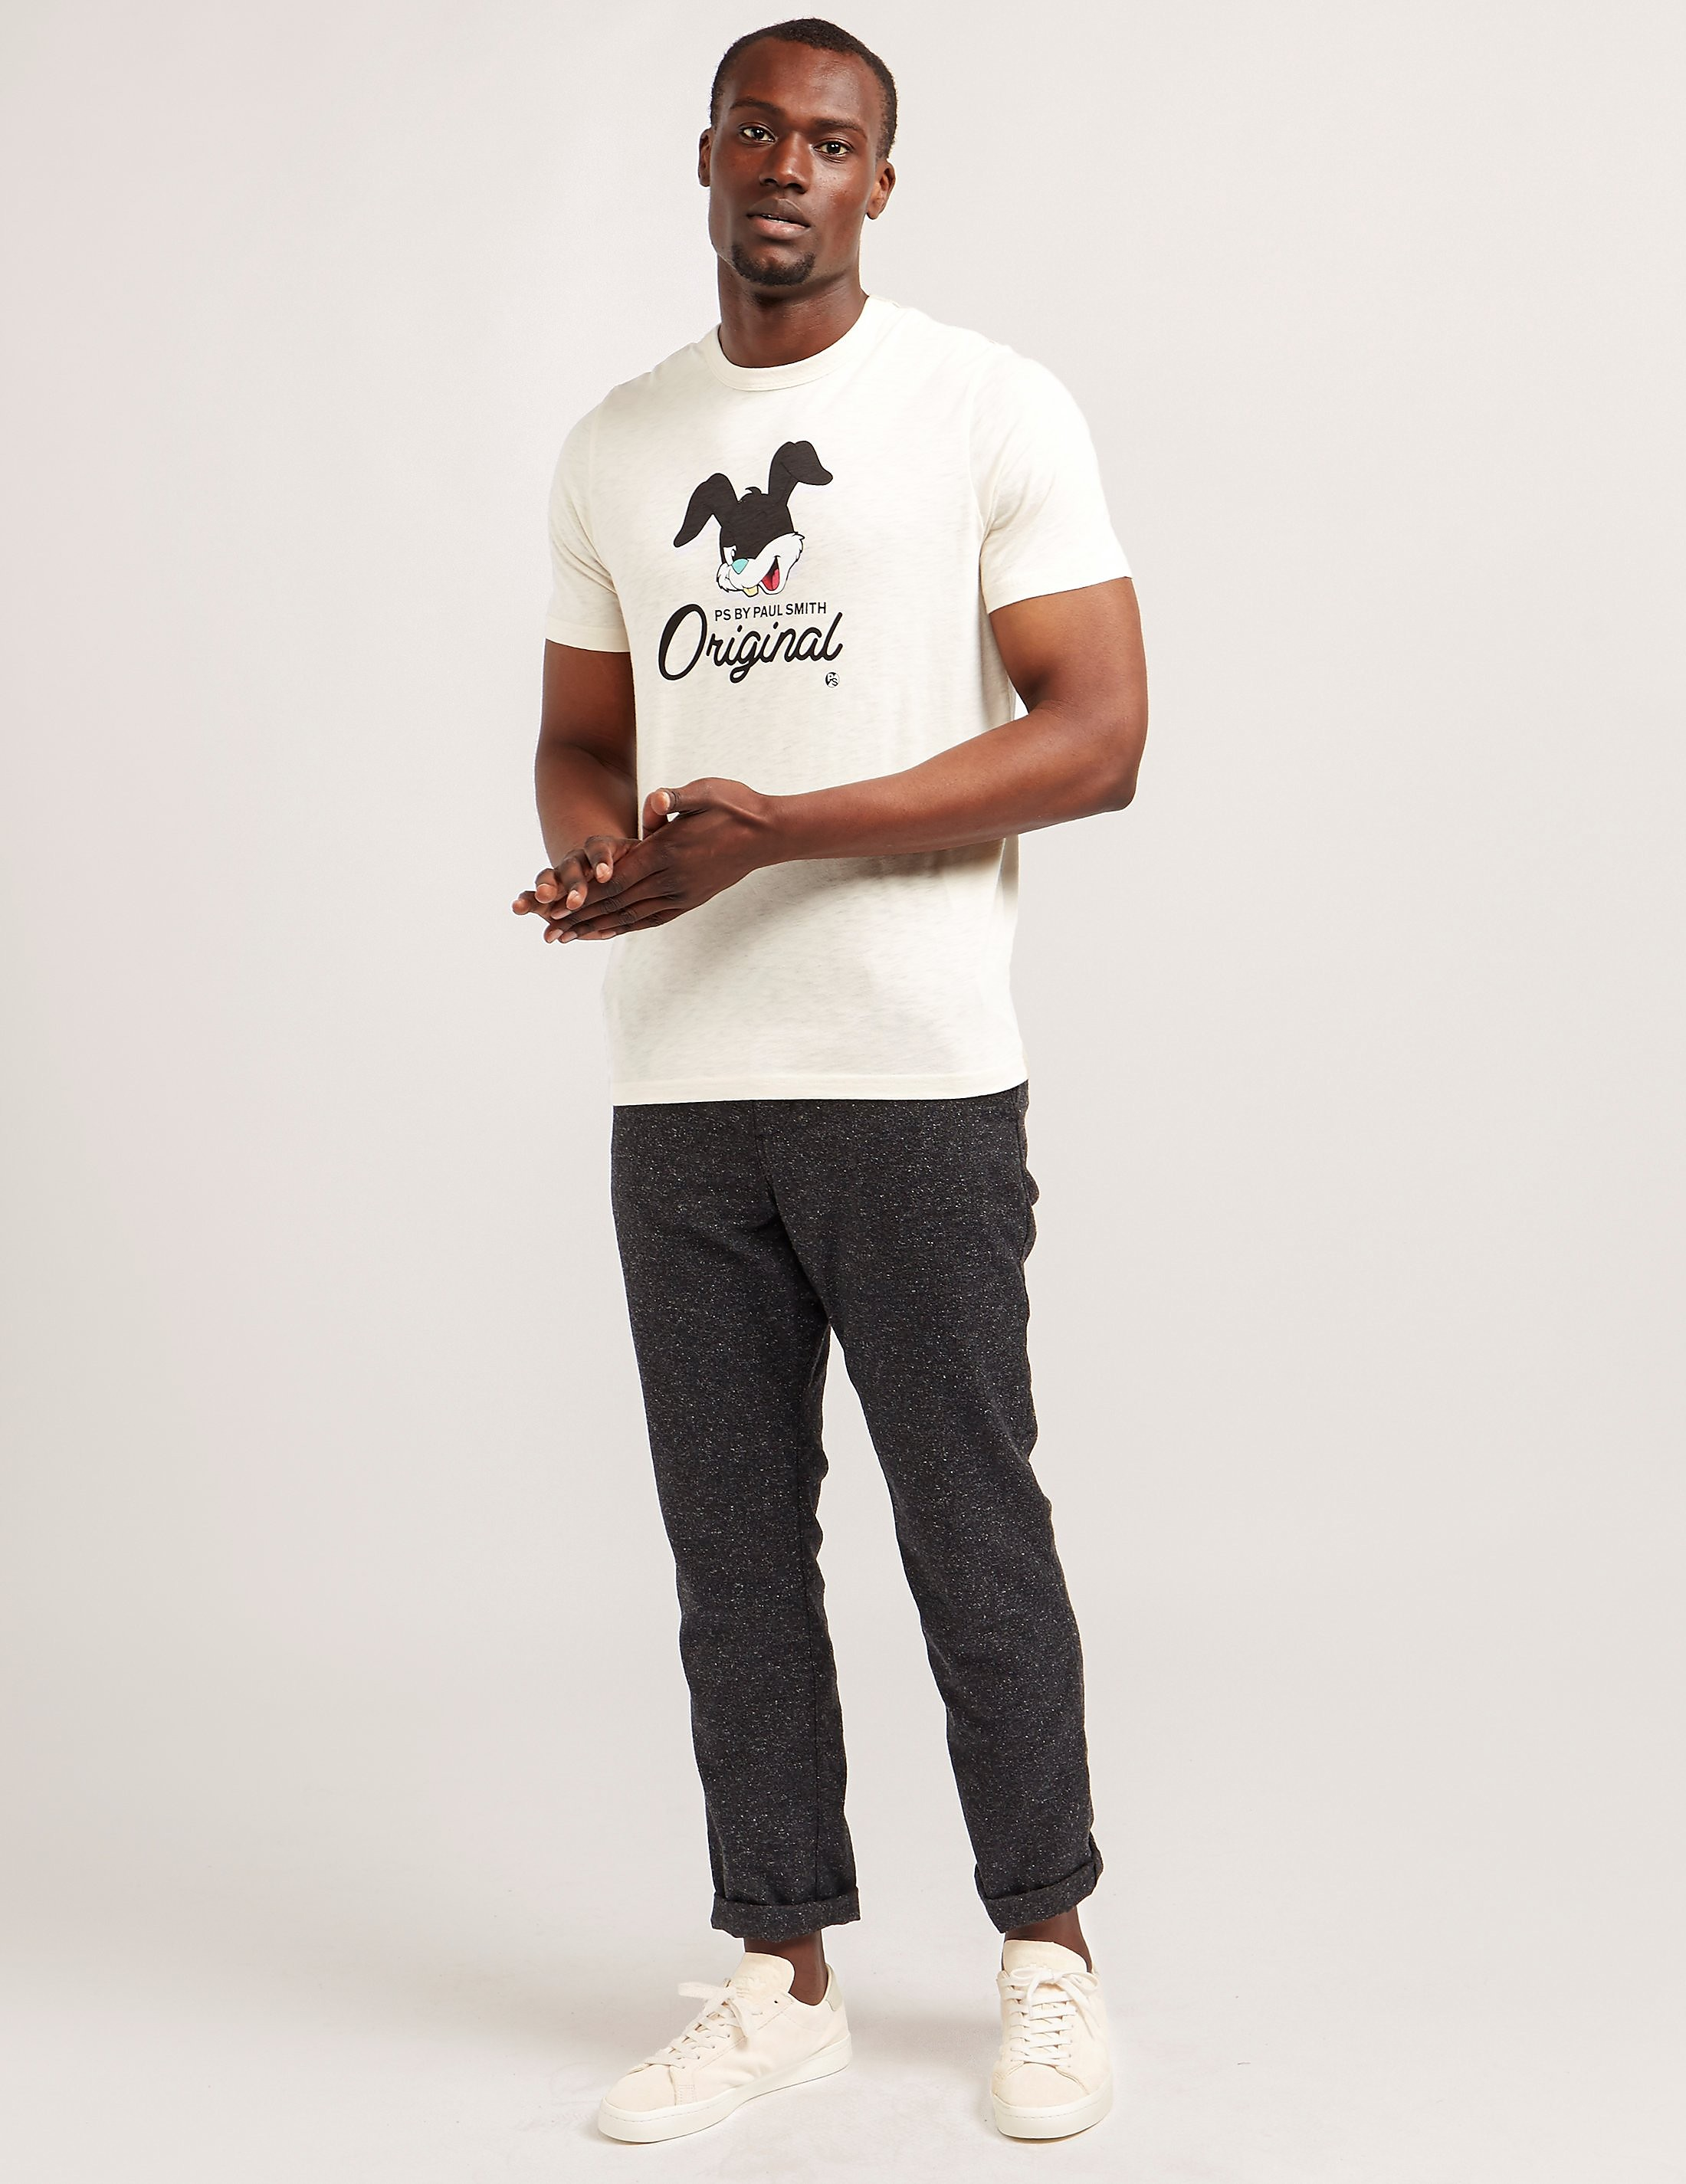 Paul Smith Original Rabbit Short Sleeve T-Shirt